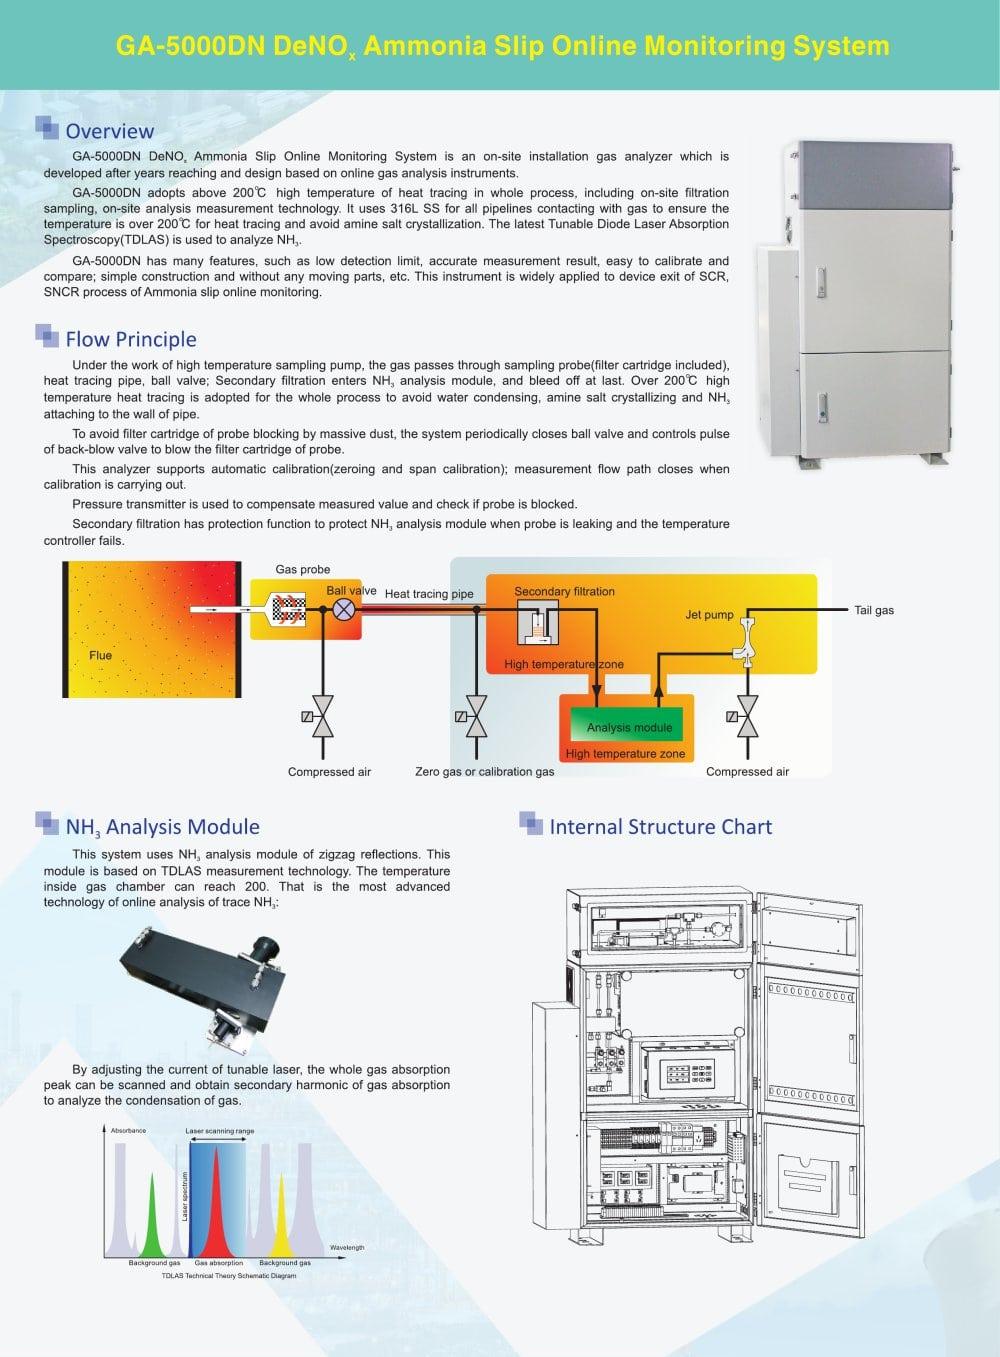 medium resolution of zetian online monitoring system tdlas ammonia slip nh3 industrial process ga 5000dn iron making steel making coking refining petrochemical flue gas